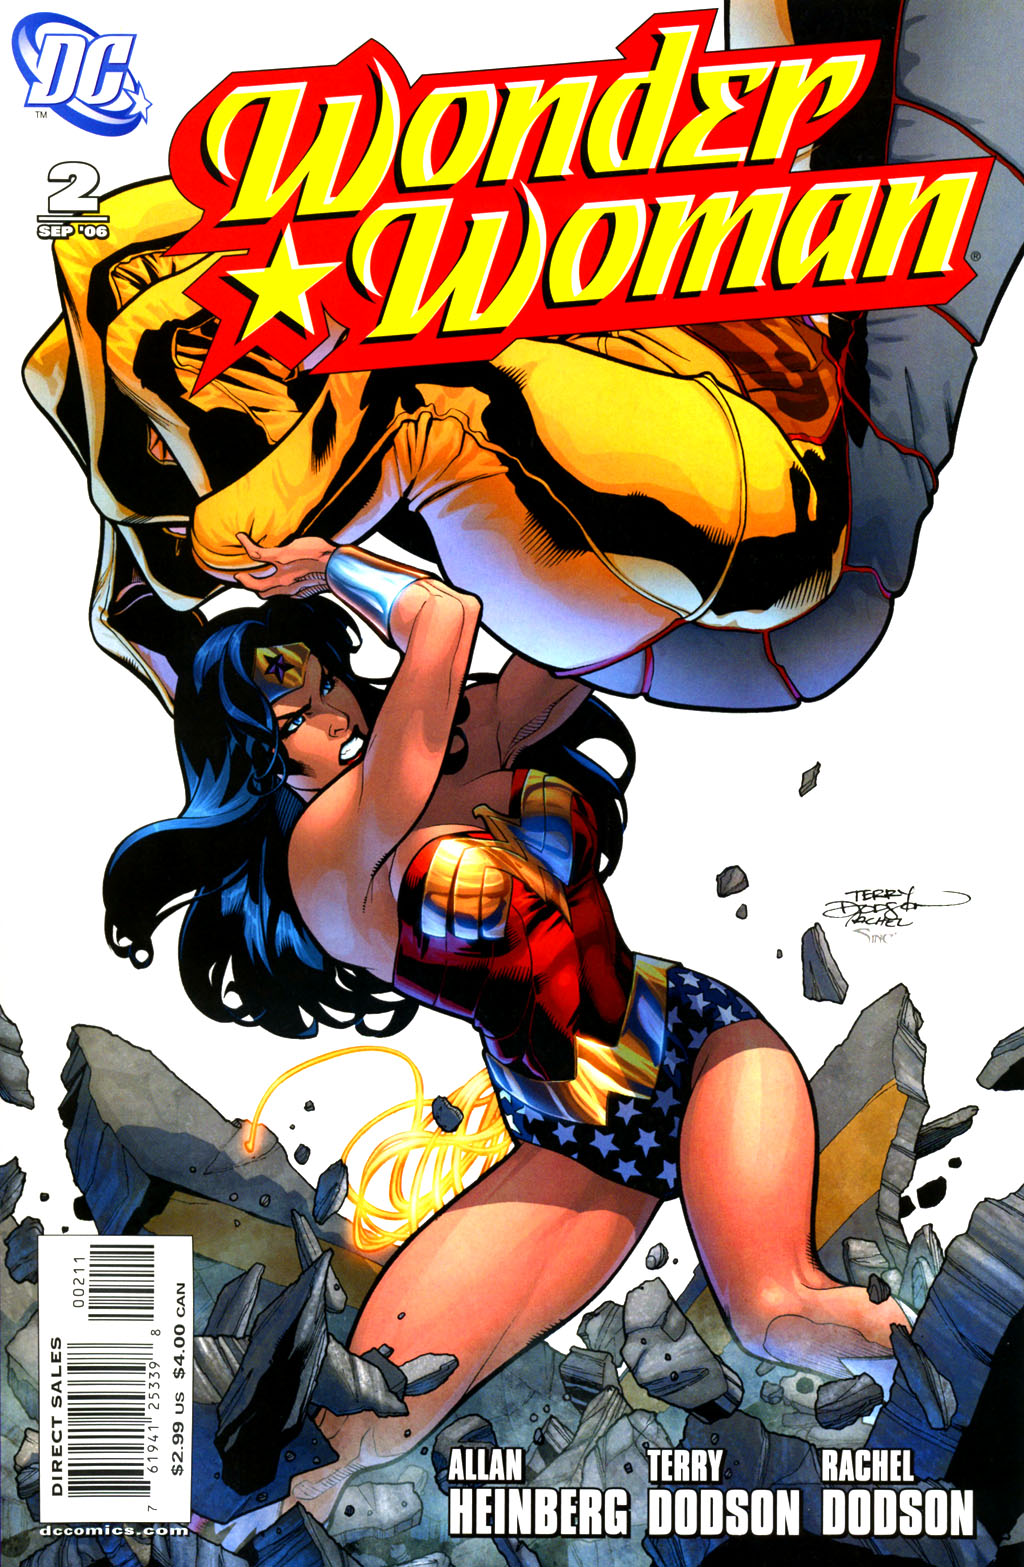 Read online Wonder Woman (2006) comic -  Issue #2 - 1